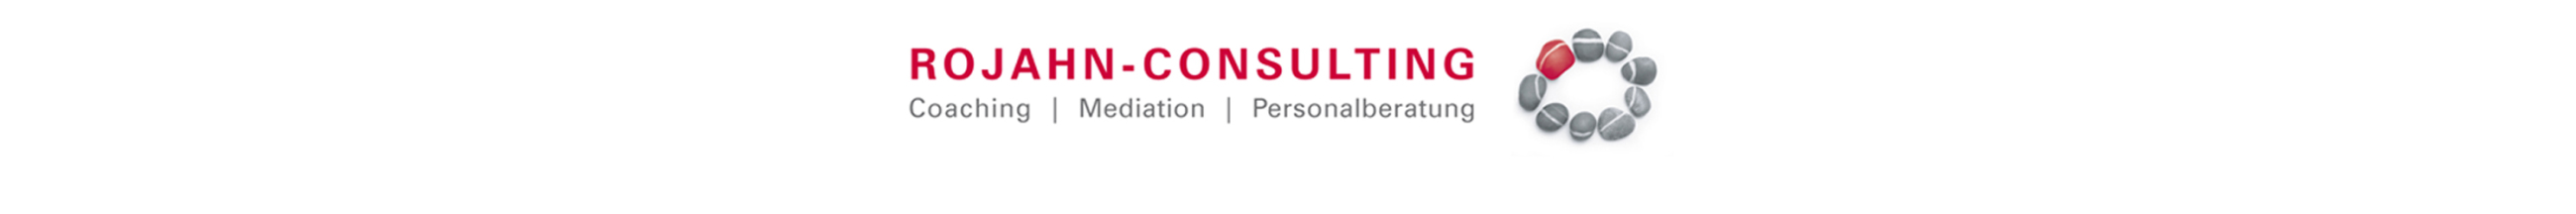 coaching, Mediation, Personalberatung; Volker Rojahn